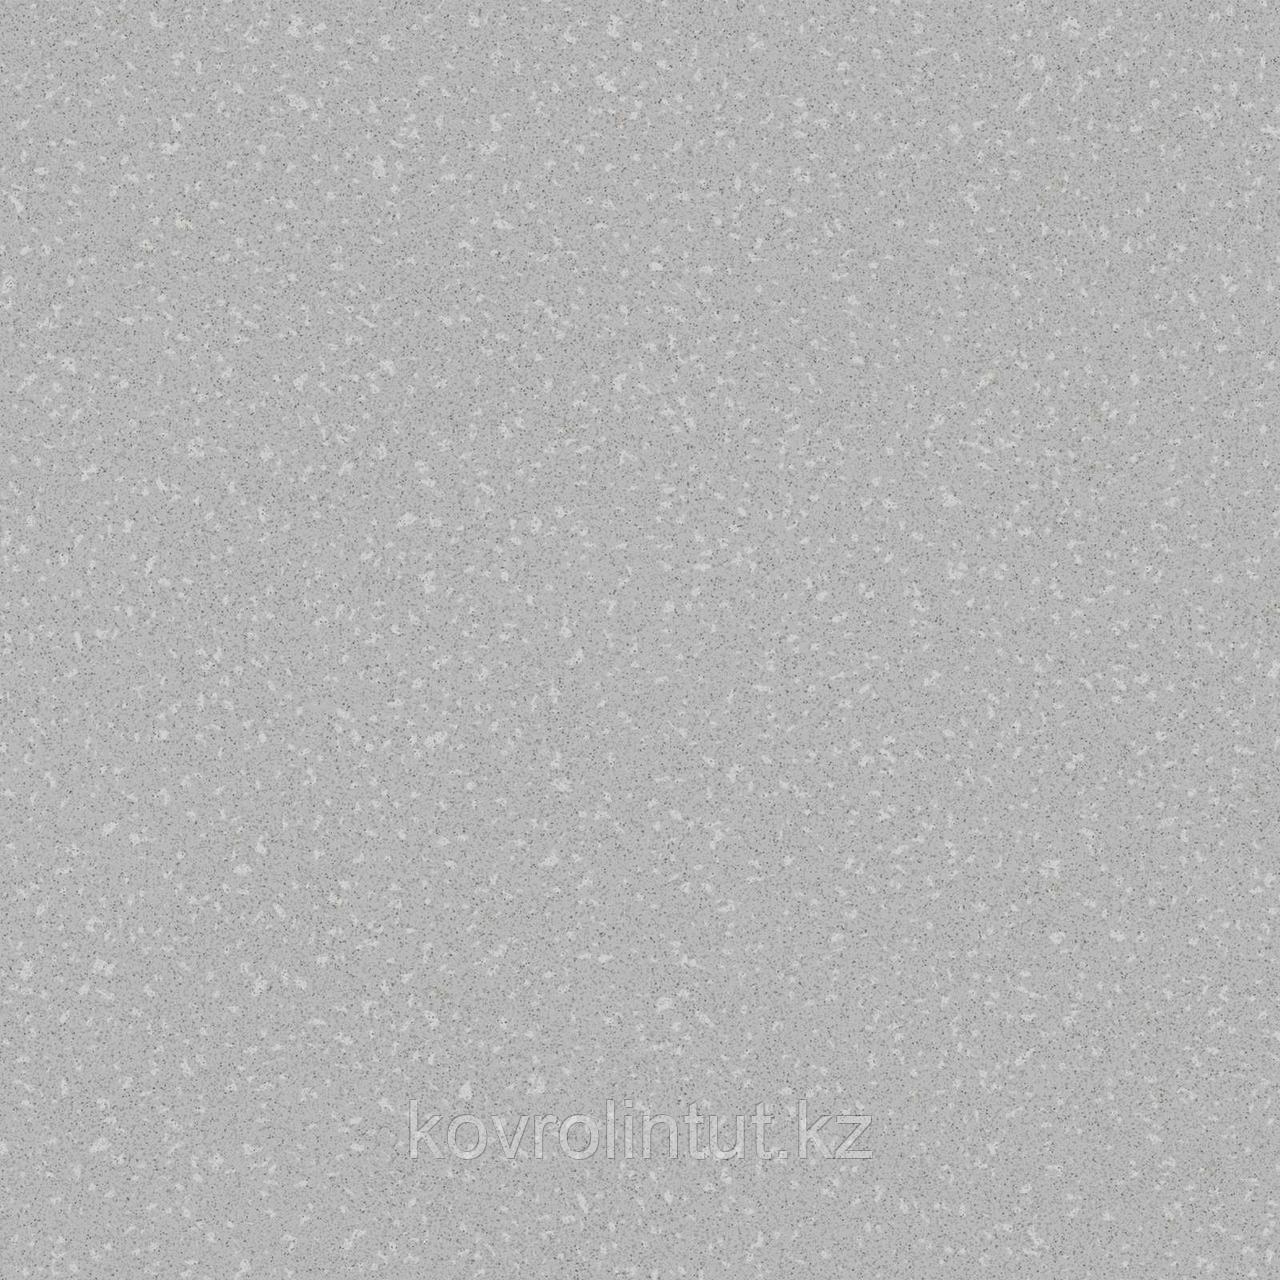 Линолеум Tarkett коммерческий Acczent Pro Aspect 2 3 м